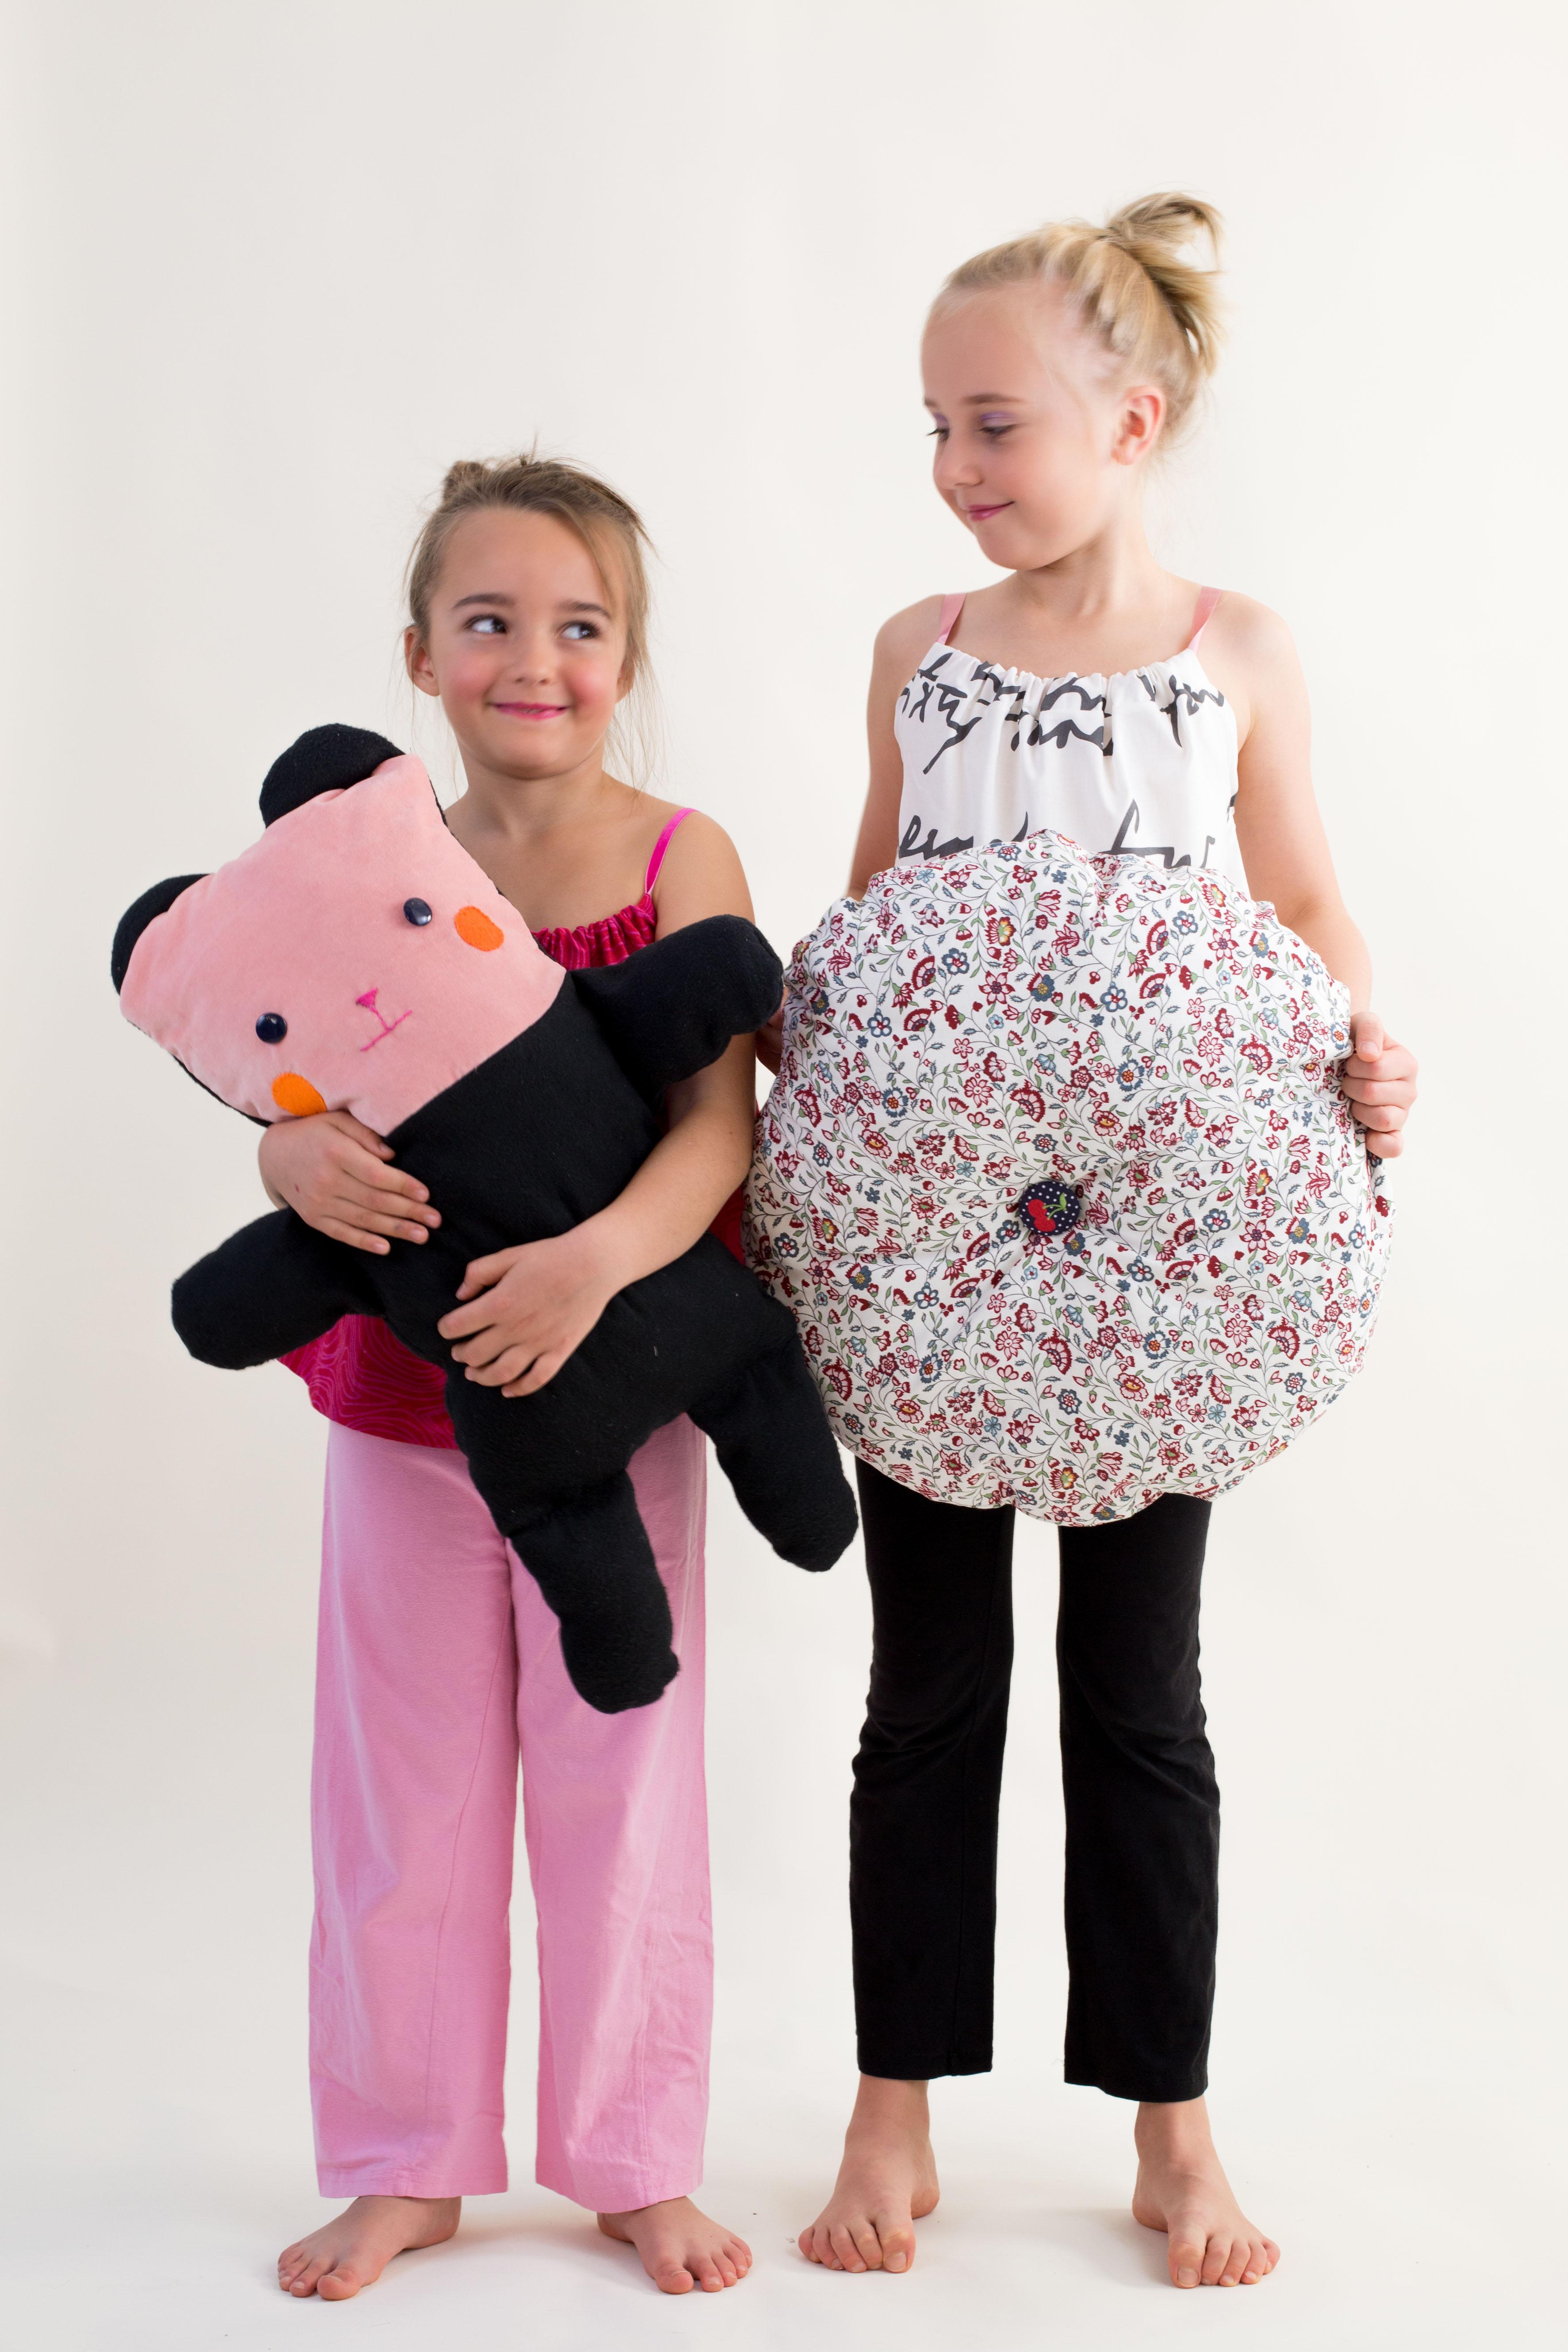 skandimama karoline hughes ikea print pillow top and teddy